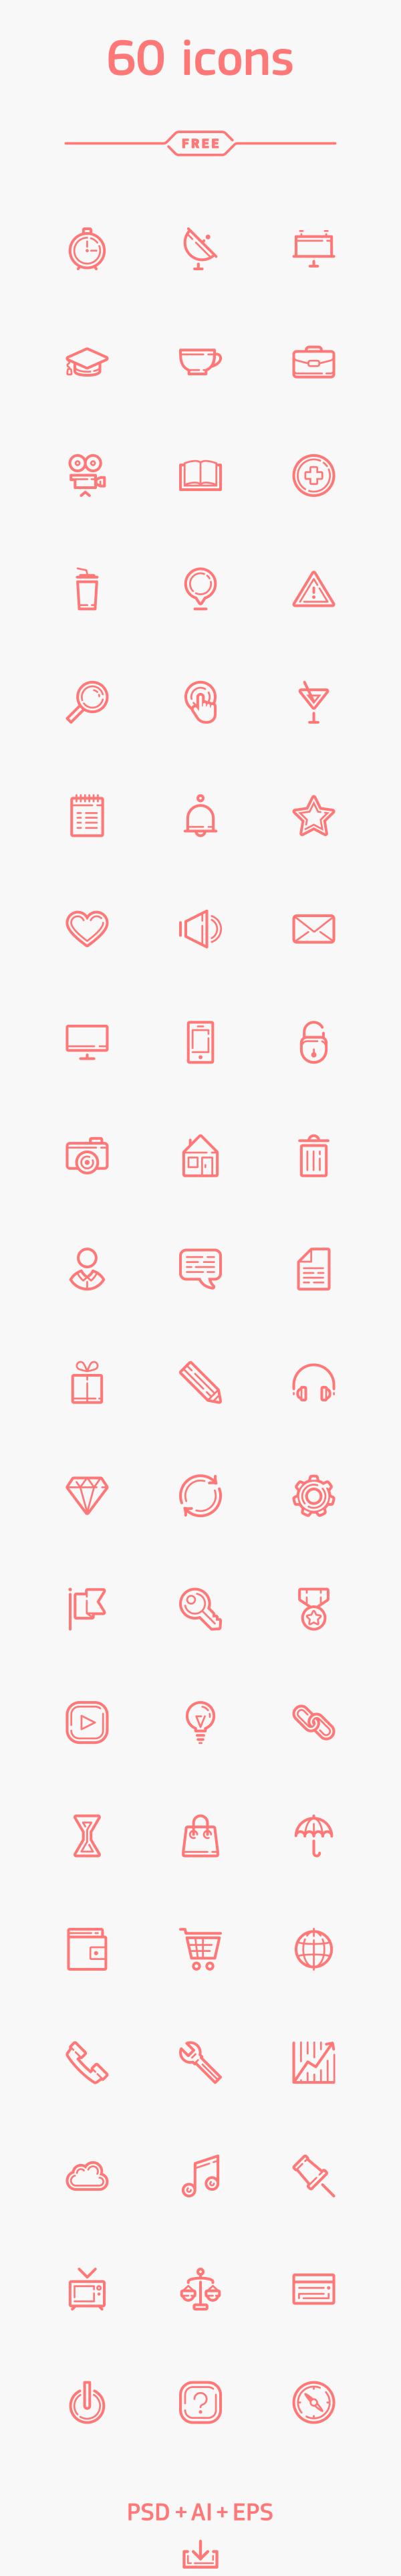 60 free icons (.Psd + .Ai + .Eps) скачать бесплатно